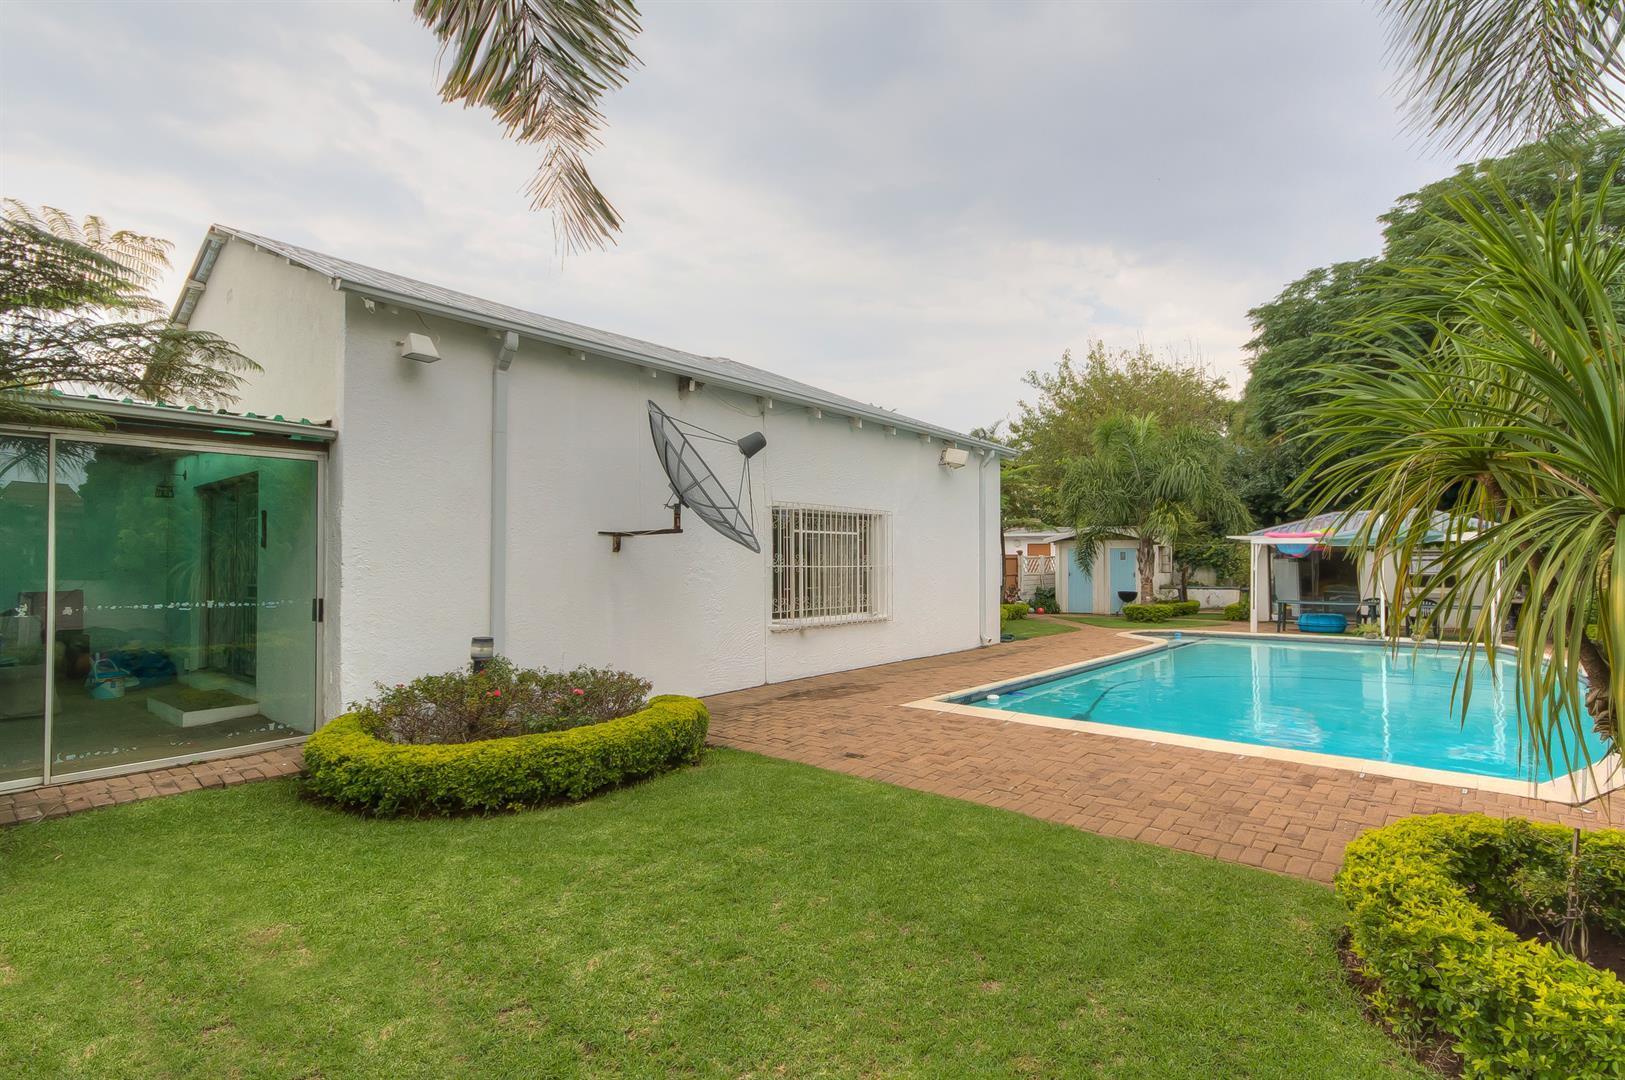 Johannesburg, Sydenham Property  | Houses For Sale Sydenham, Sydenham, House 6 bedrooms property for sale Price:3,690,000